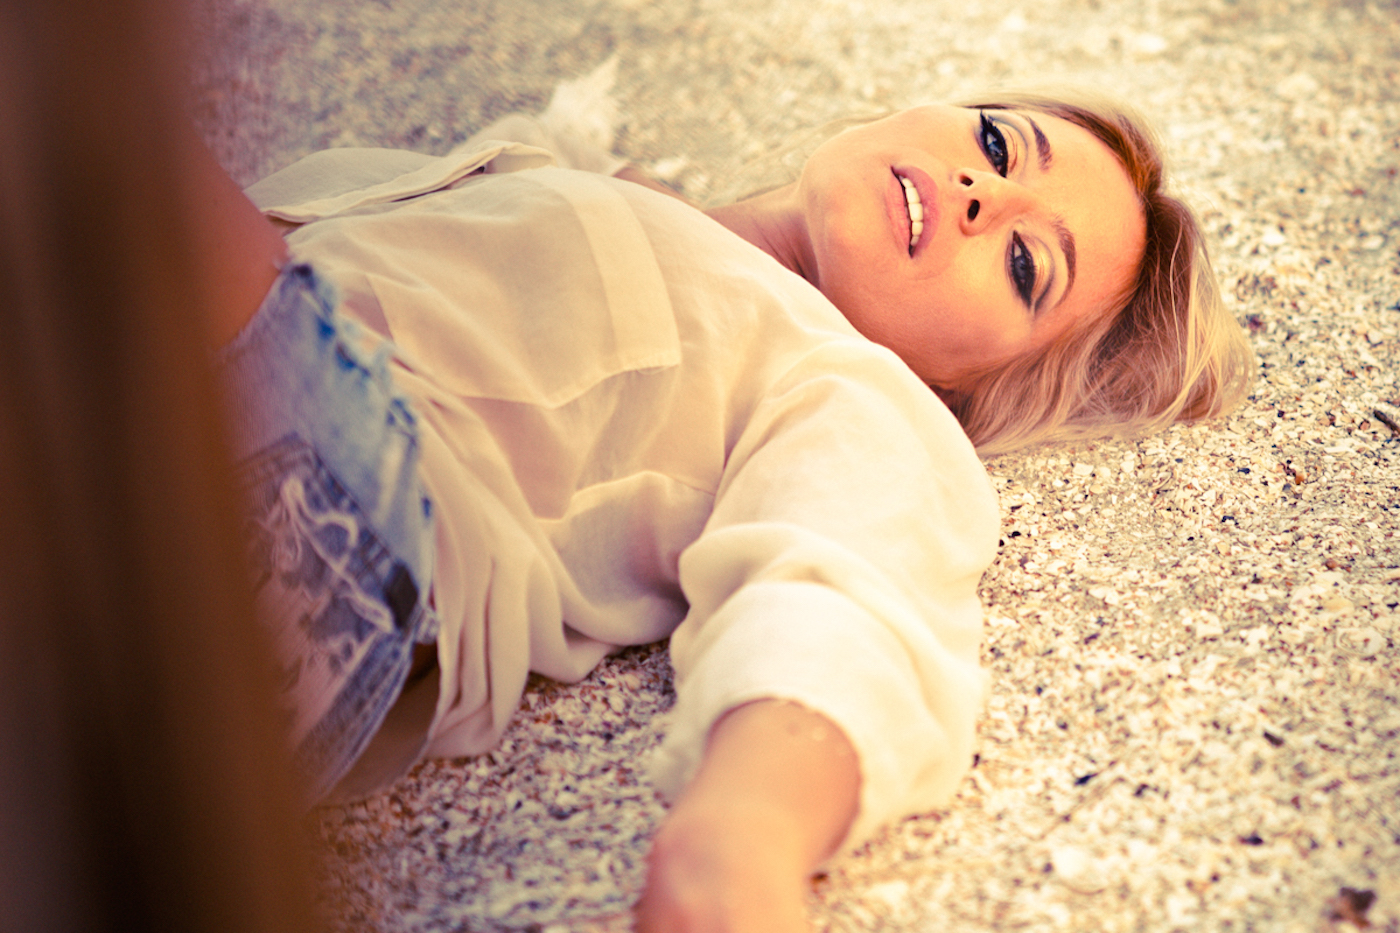 laura_rong_raw-103